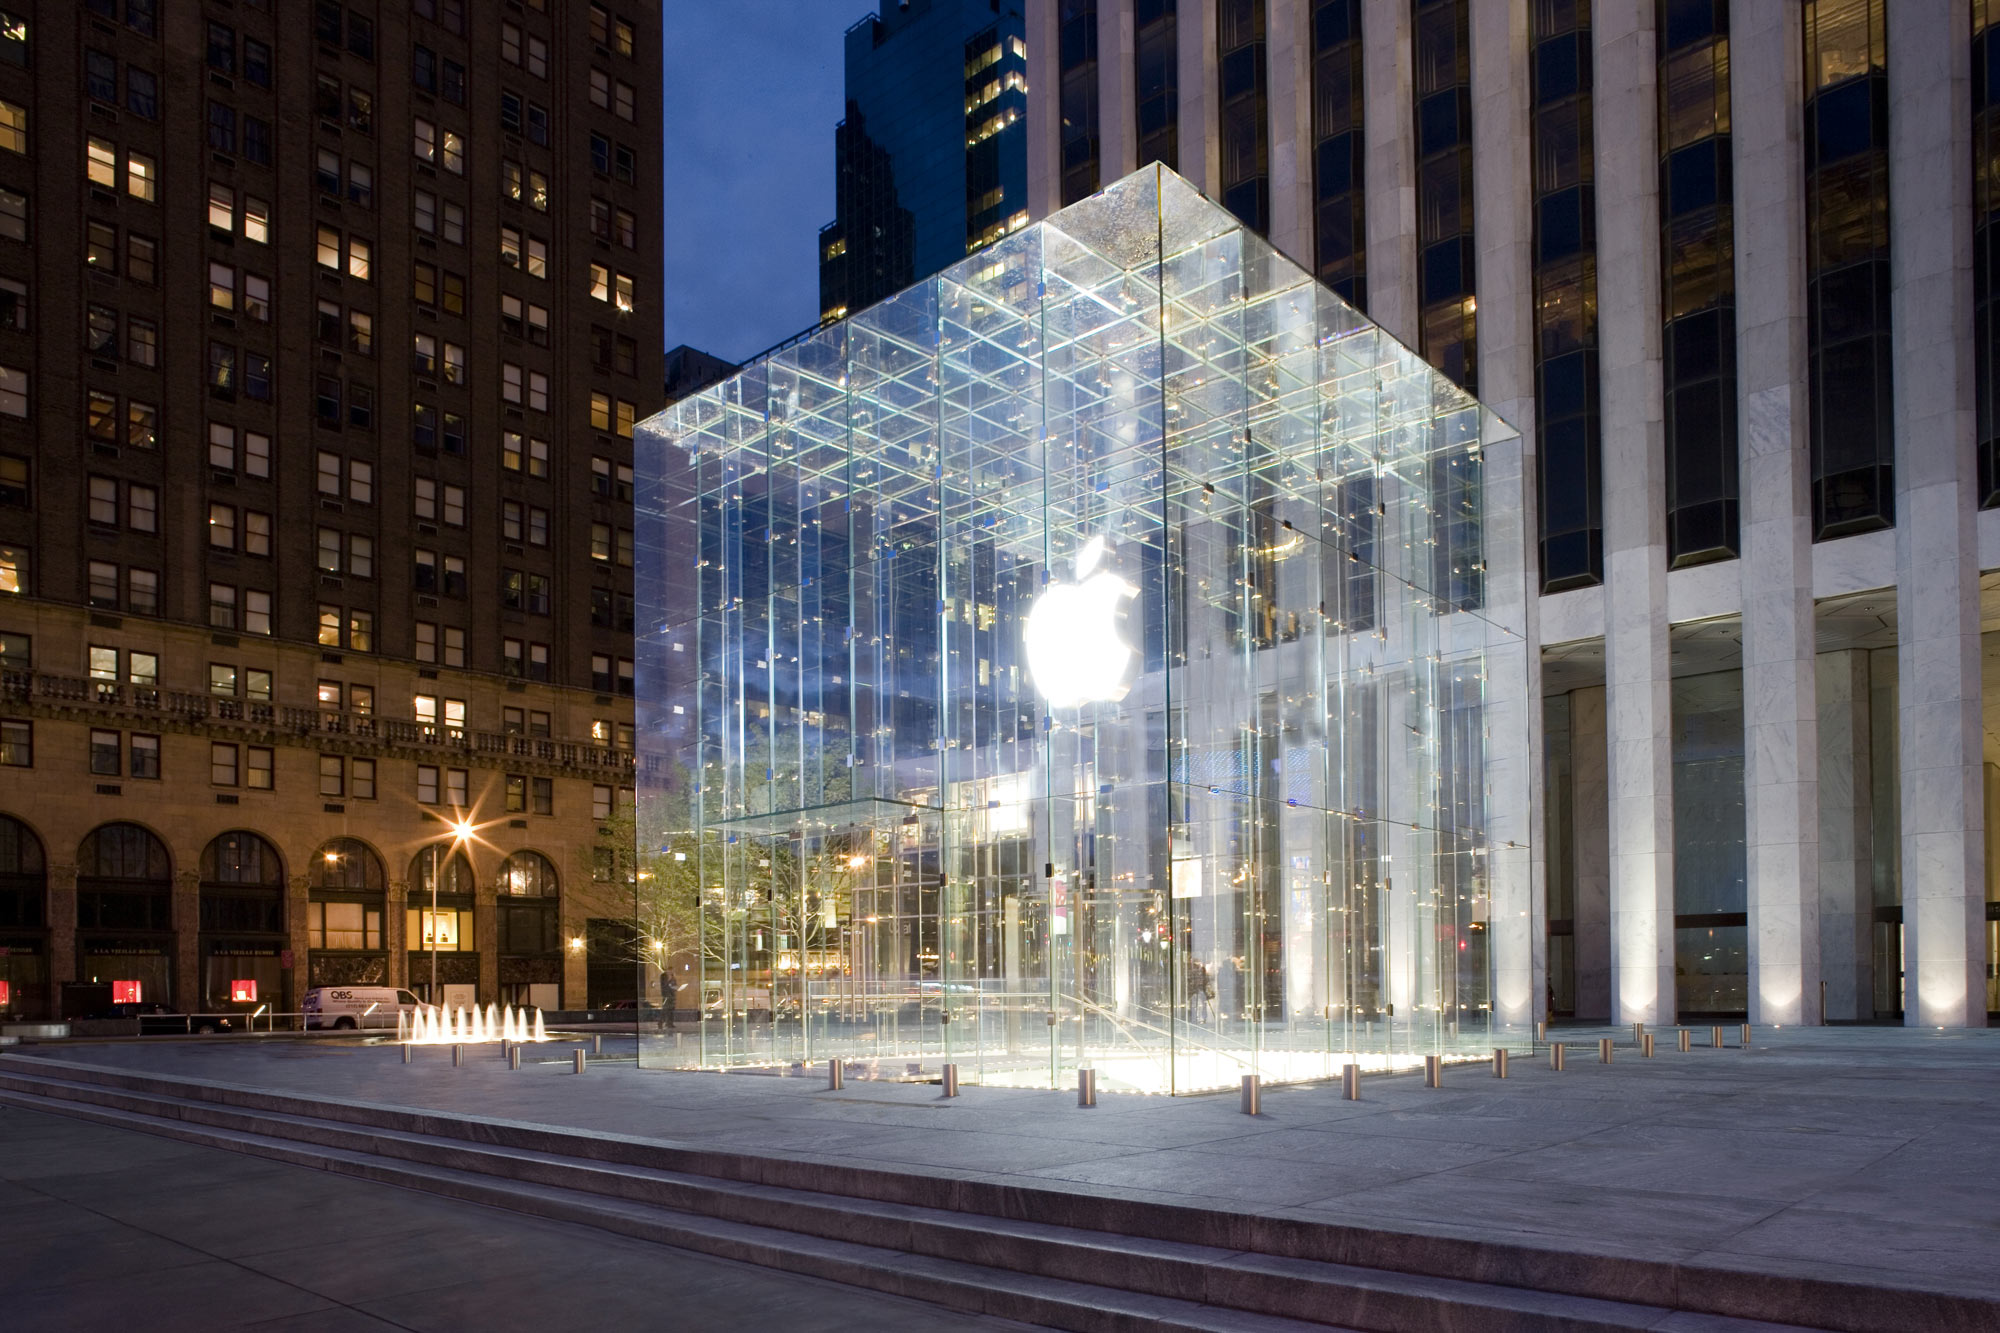 Apple Store, New York City widescreen wallpaper | Wide-Wallpapers NET